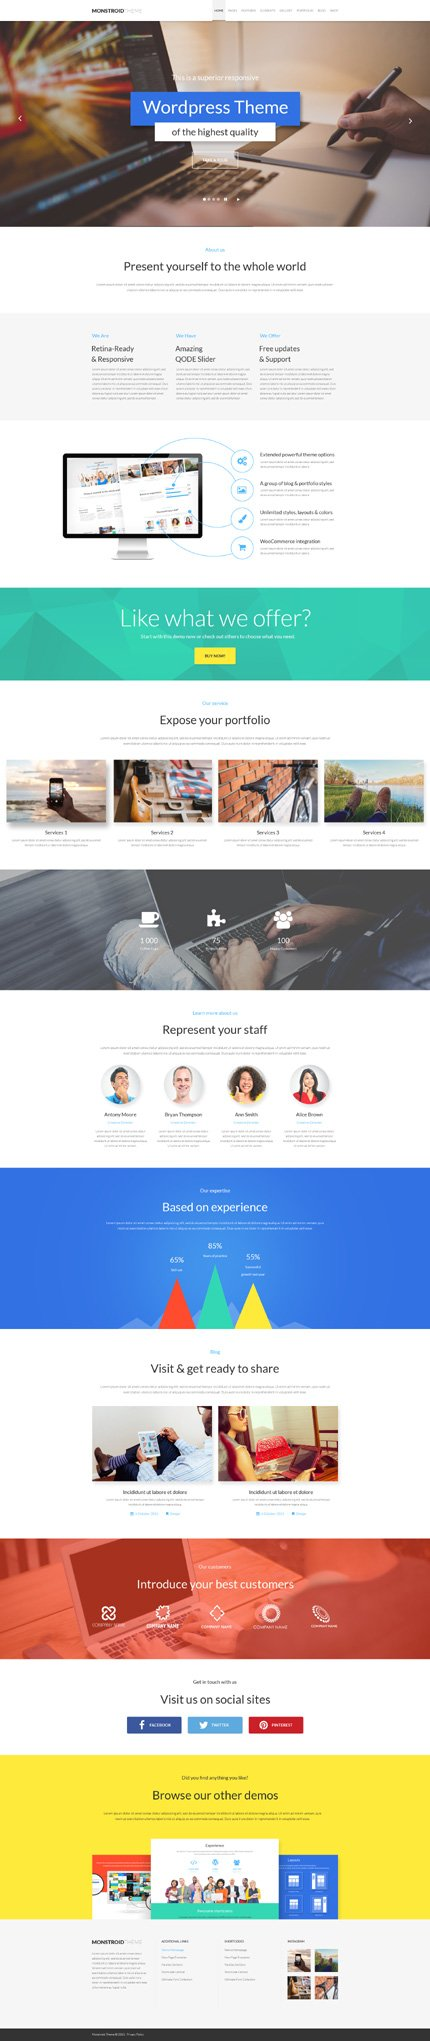 WordPress Theme/Template 54984 Main Page Screenshot